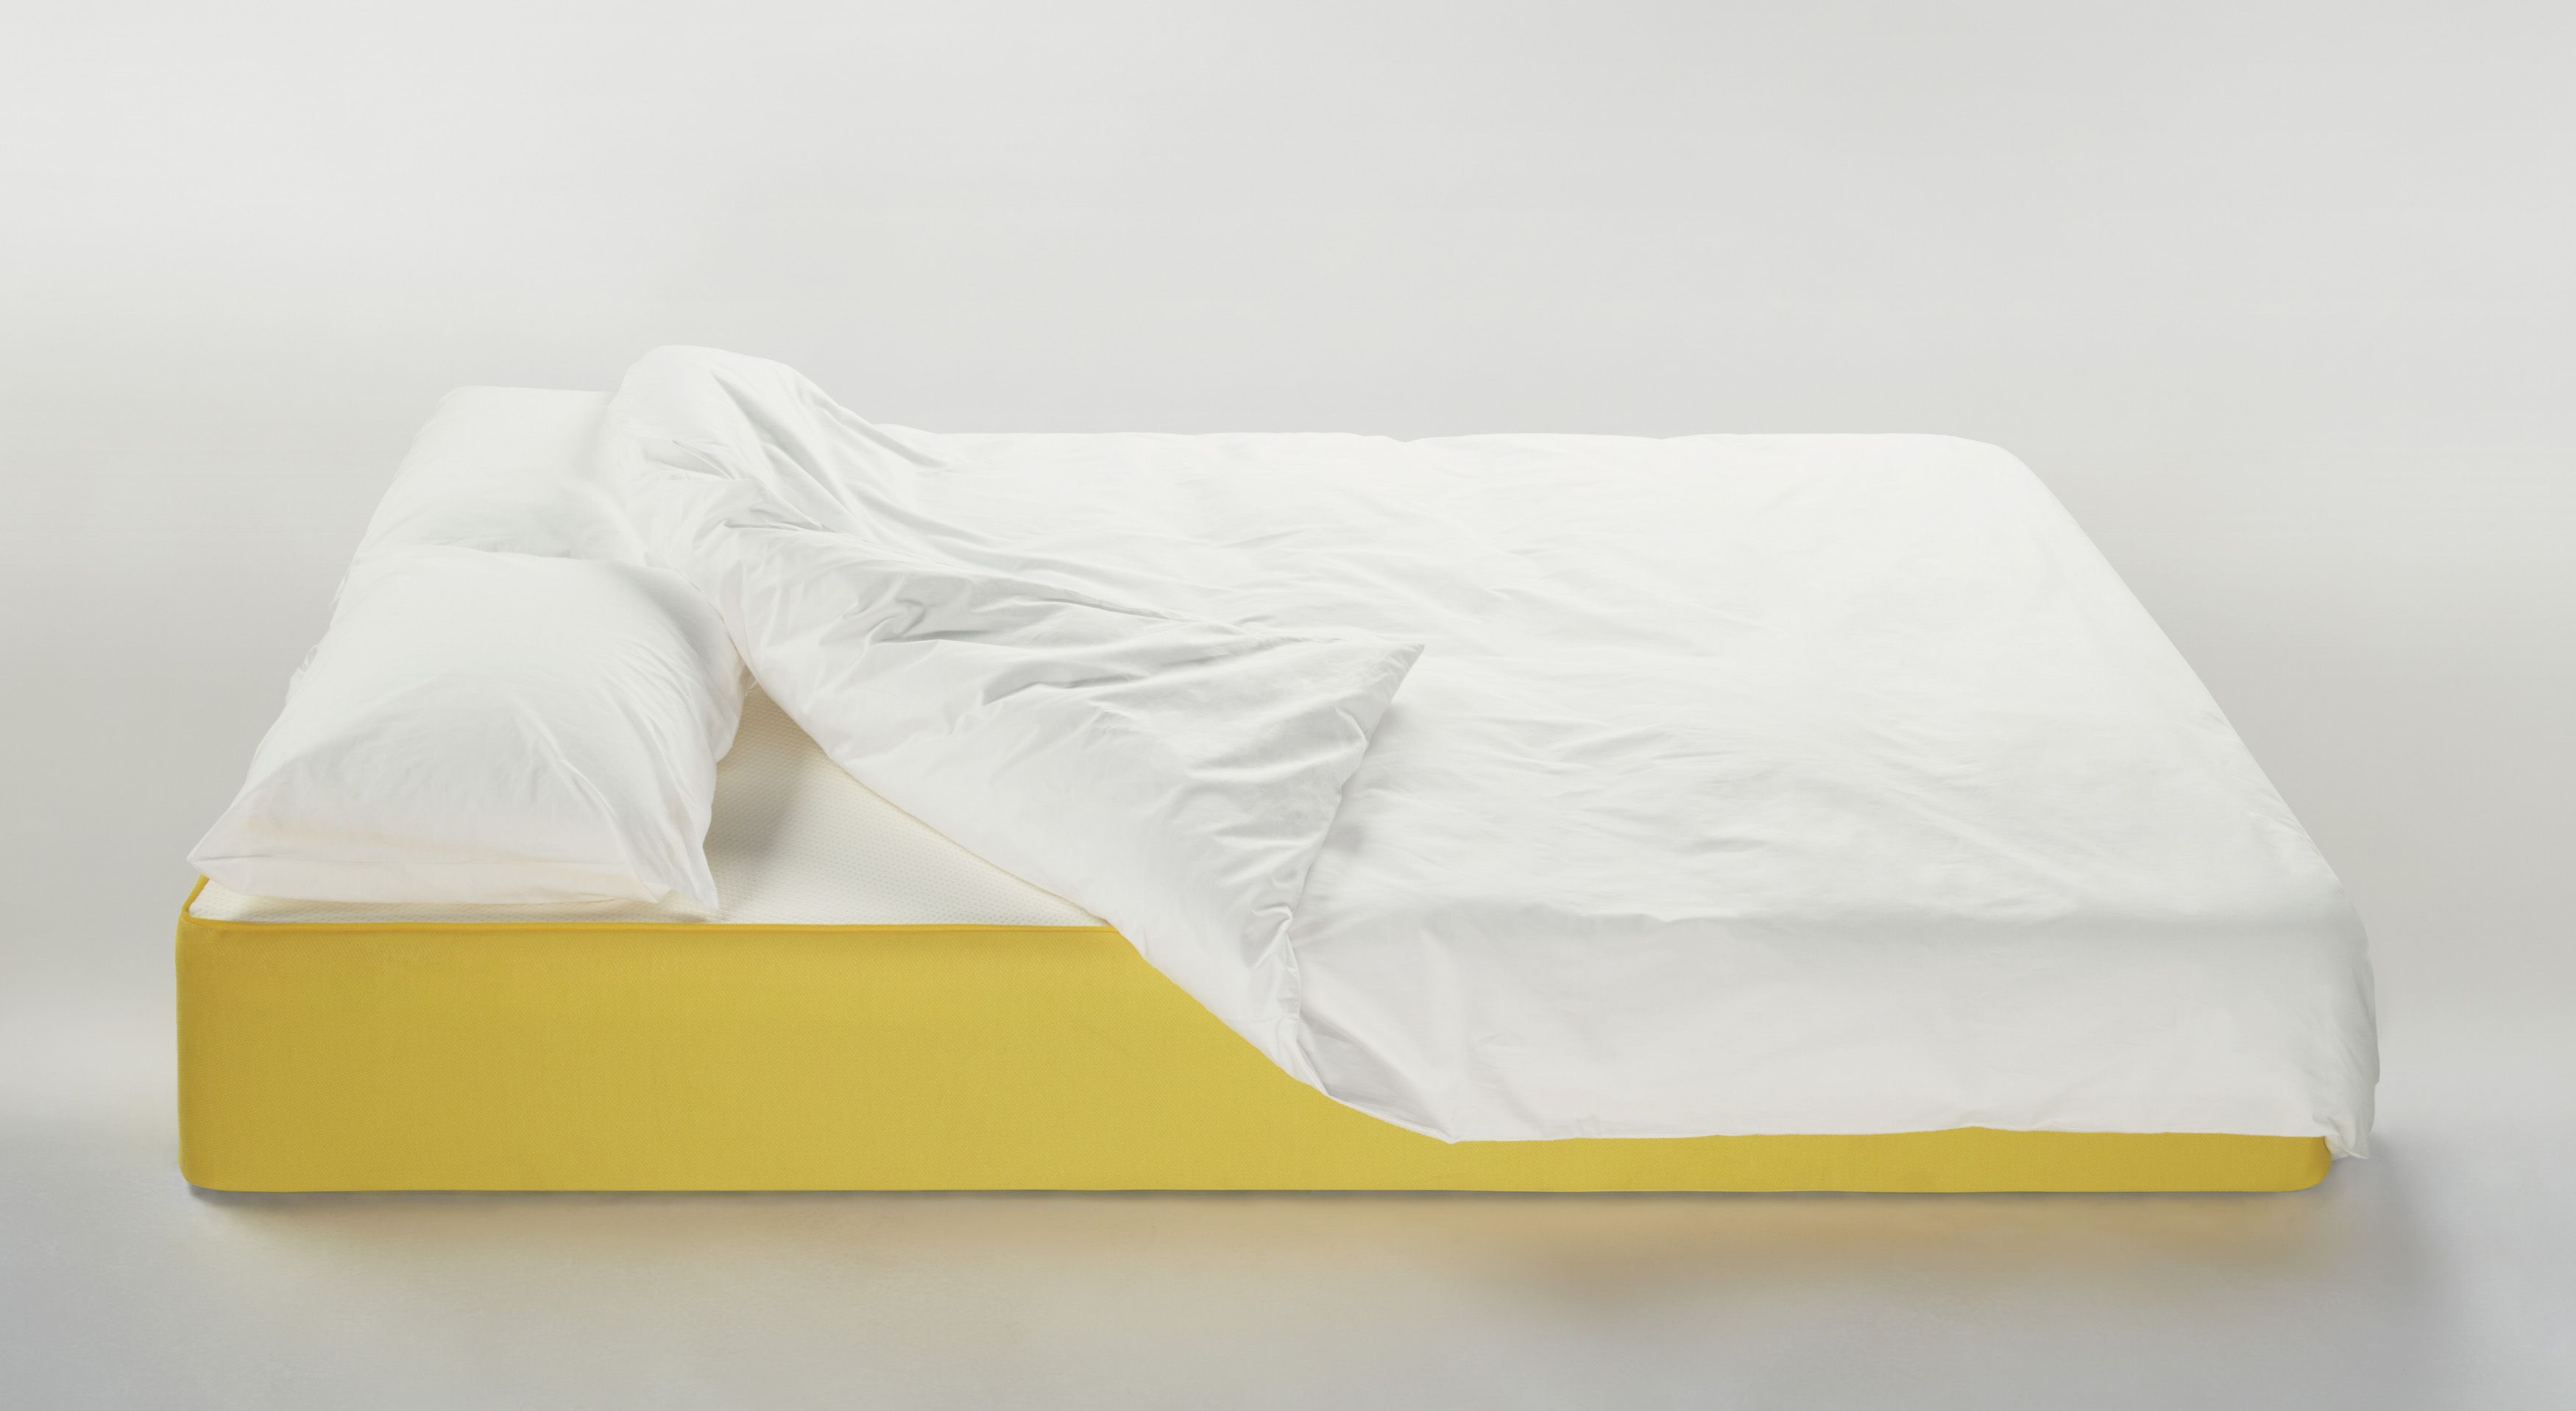 safavieh com bed foam plus ip dreamfoam mattress dream grey white bedding firm walmart